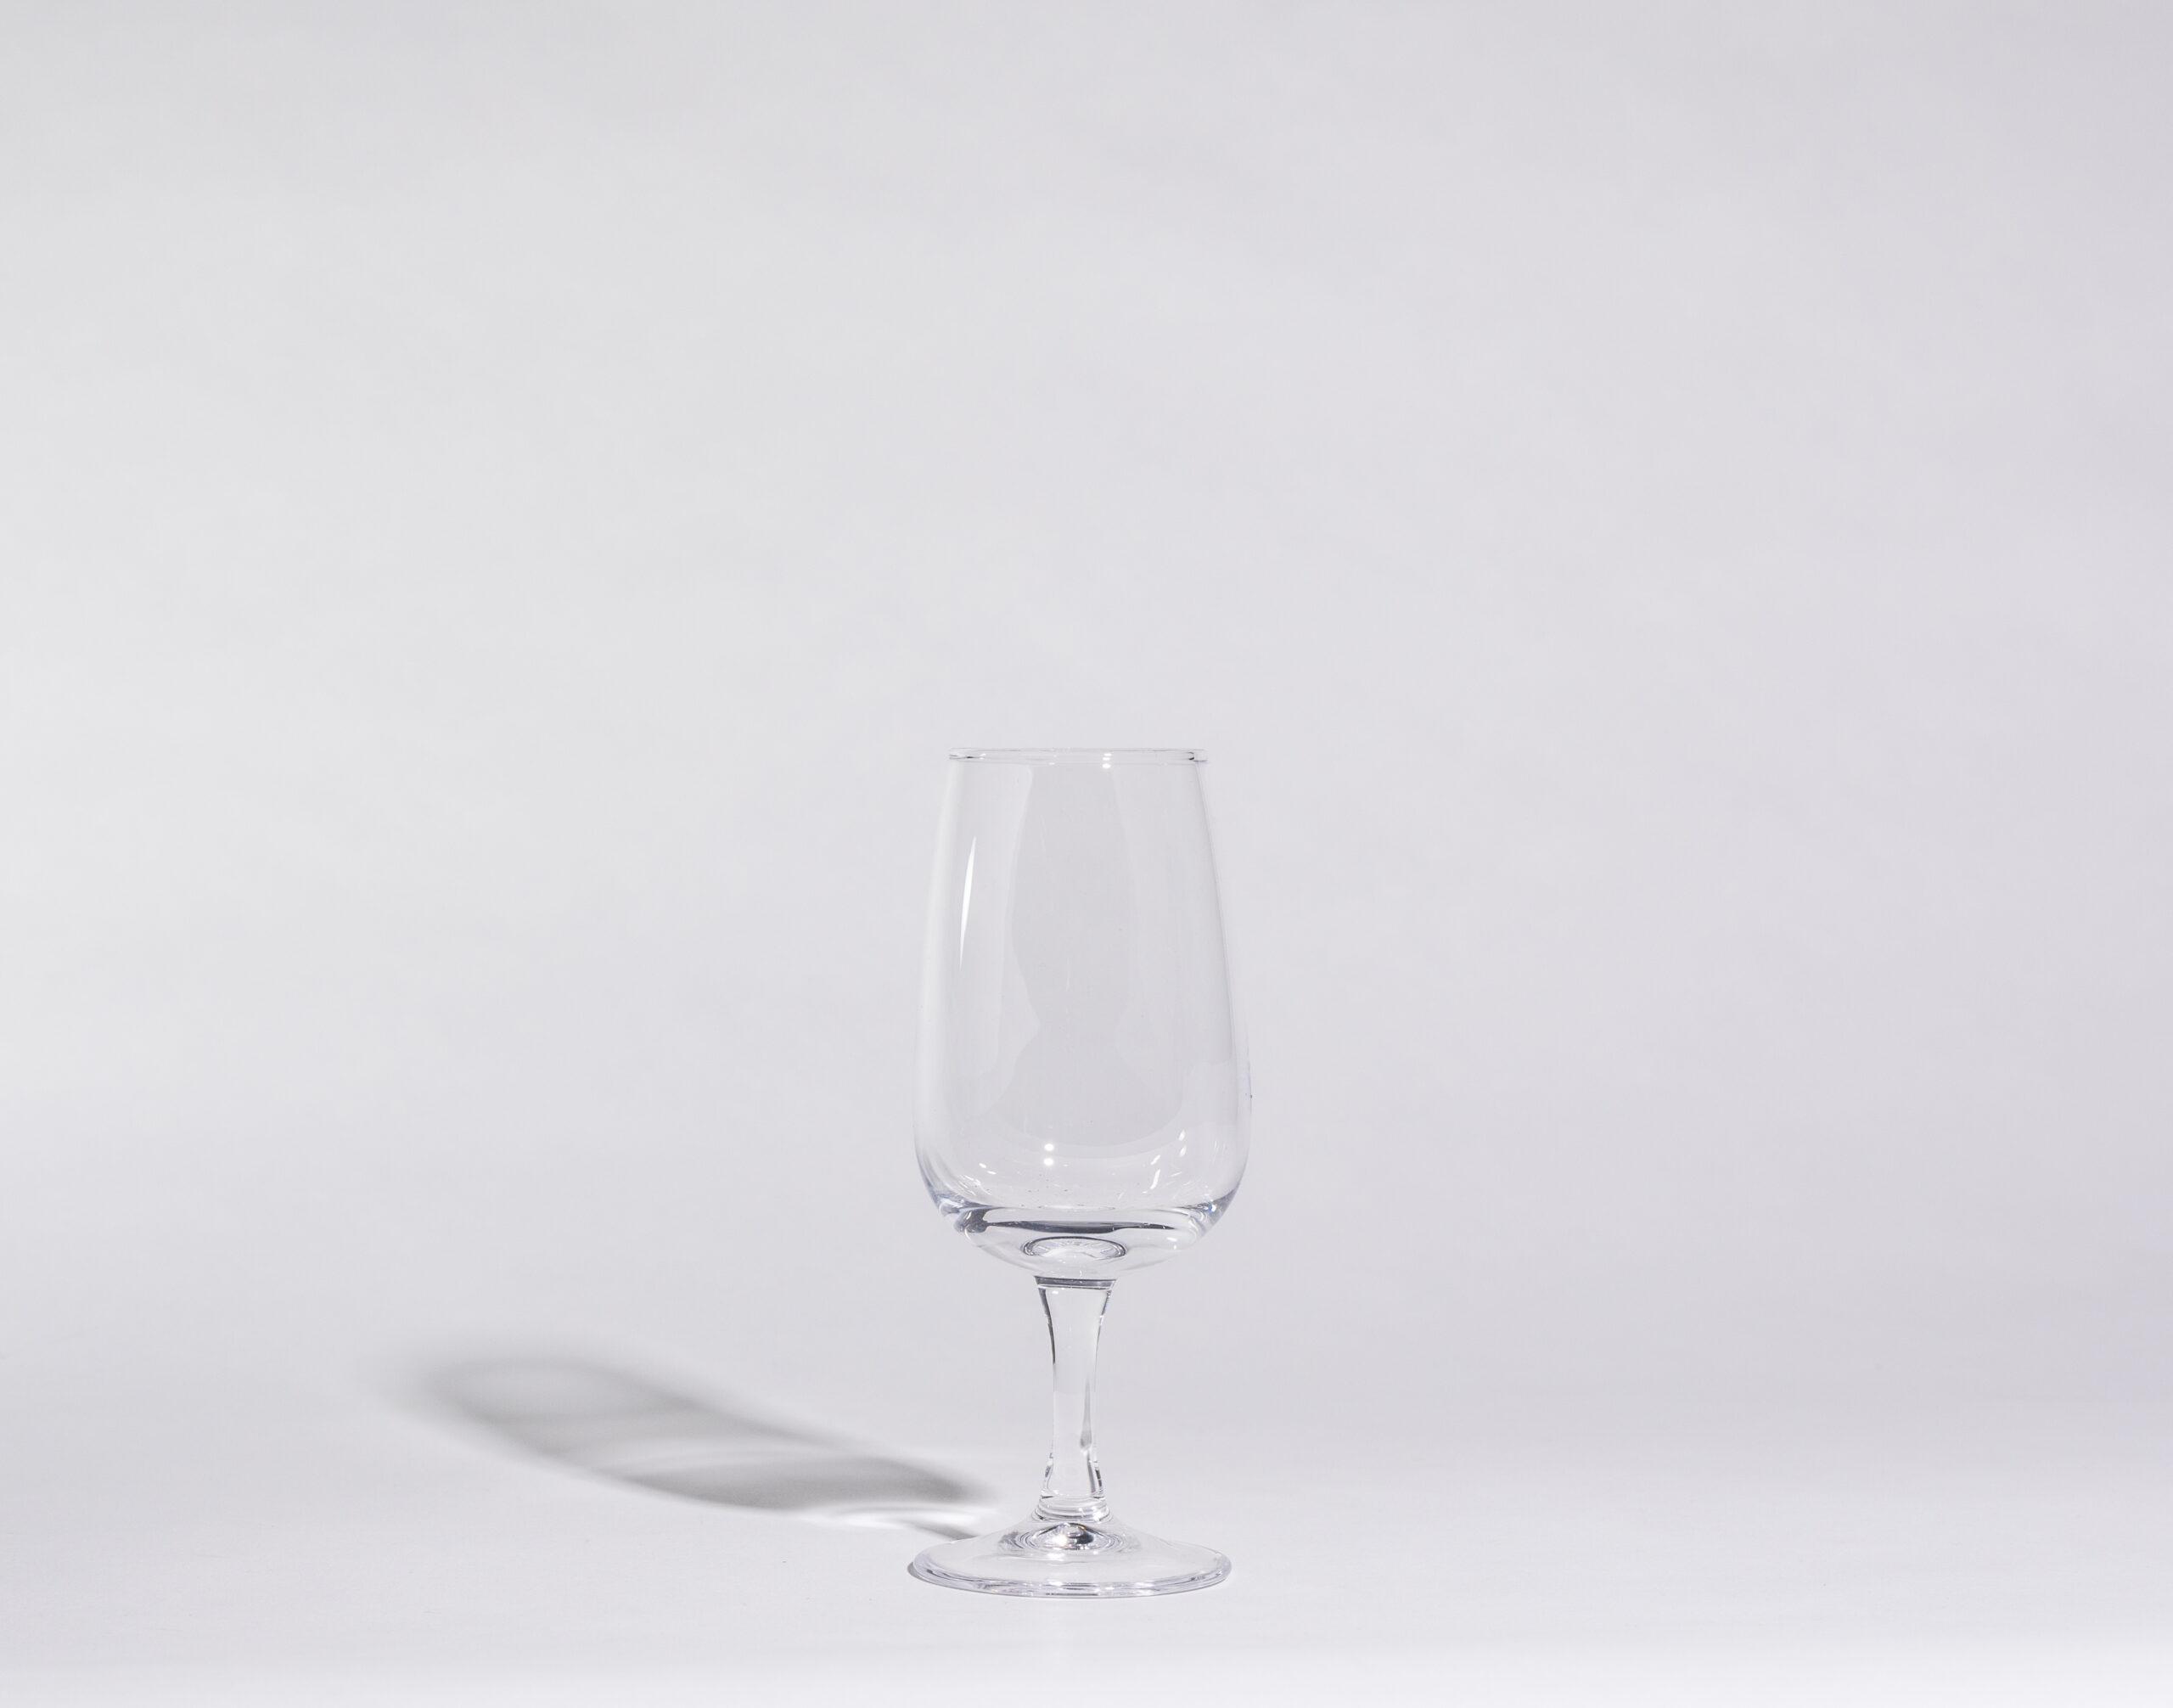 Sherry glasses (3oz, stemmed)